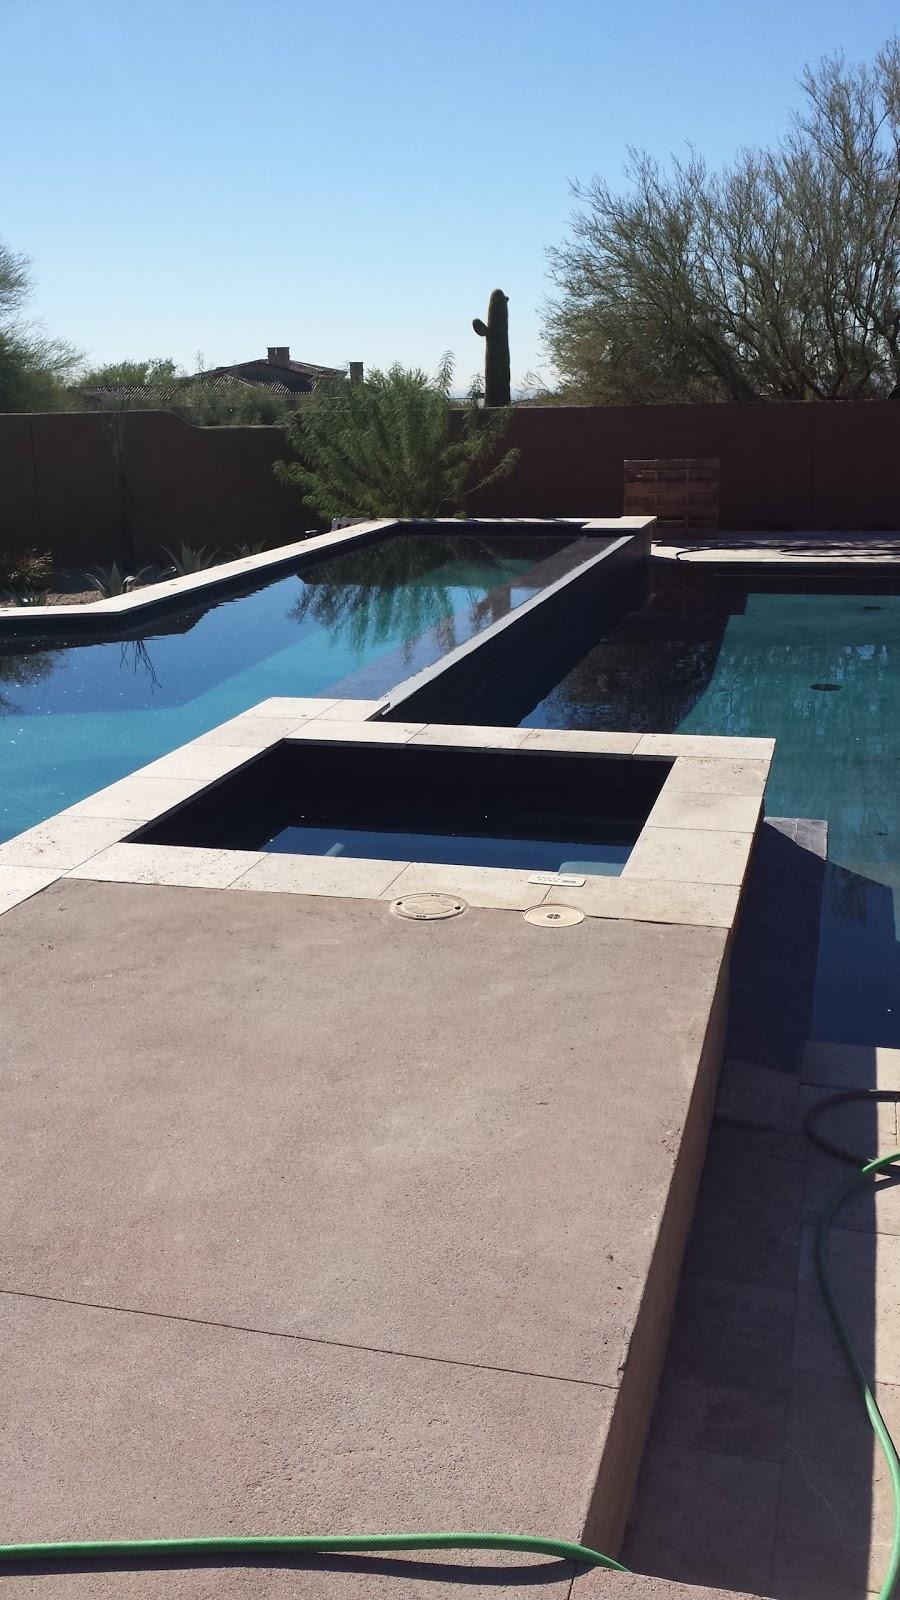 Leak Hunters: Leak Detection - plumber    Photo 5 of 10   Address: 8379 W Midway Ave, Glendale, AZ 85305, USA   Phone: (623) 980-2888